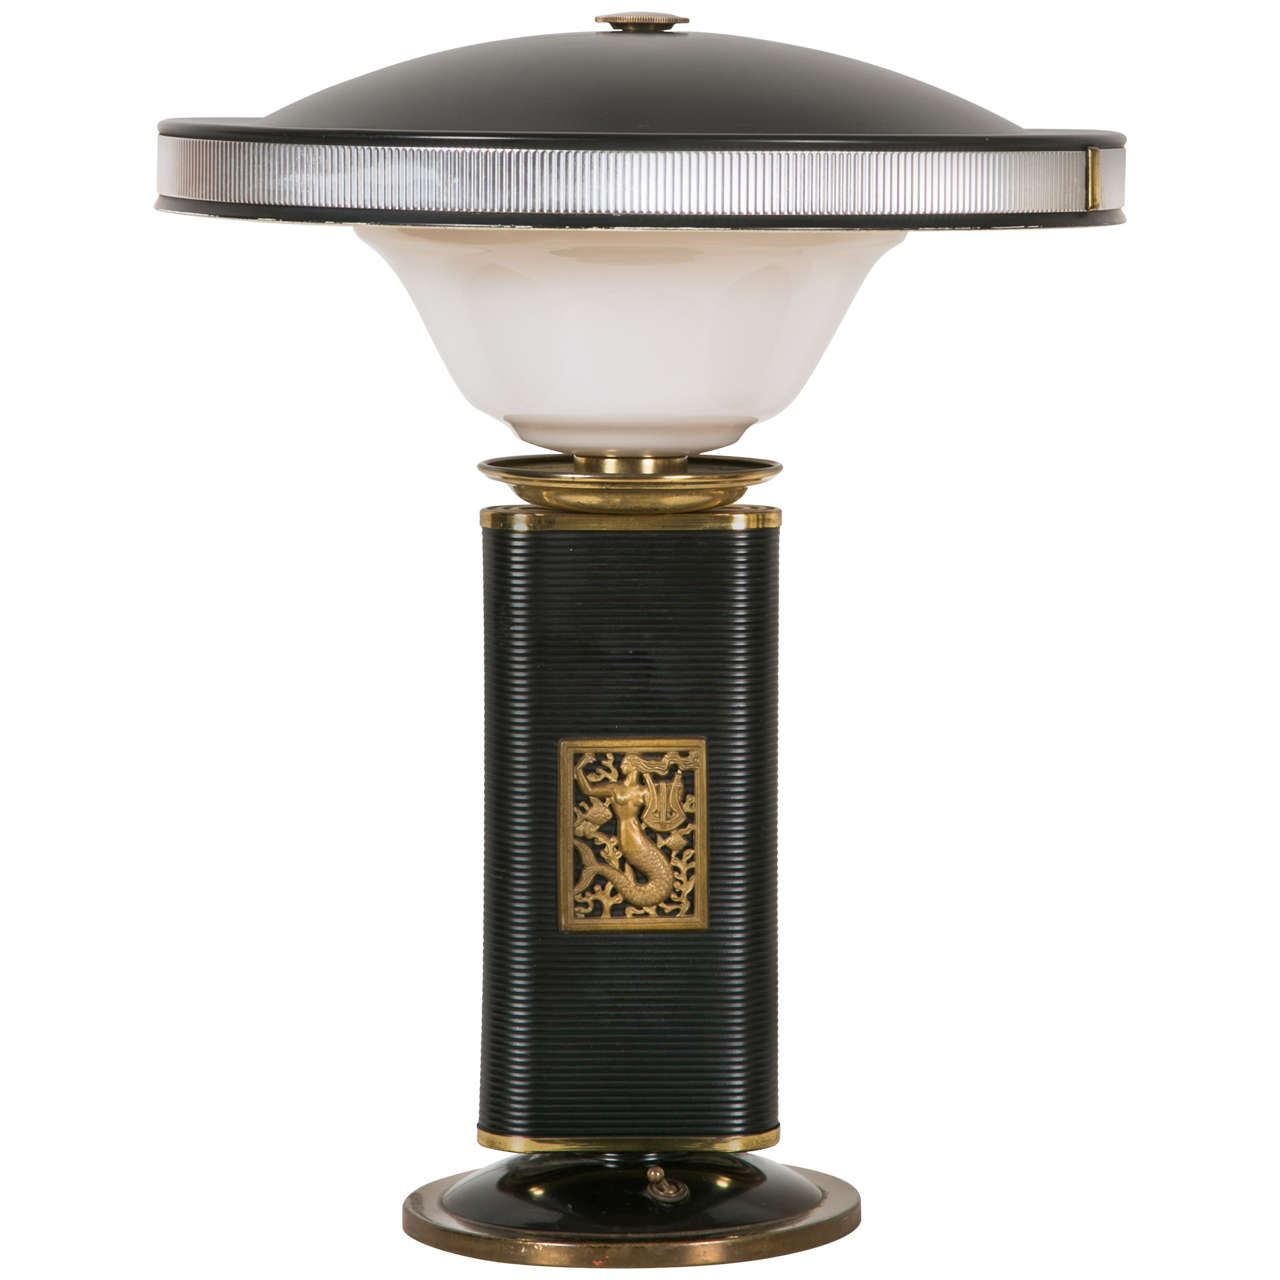 1945 1950s Table Lamp Sir 232 Ne Eileen Gray By Jumo At 1stdibs